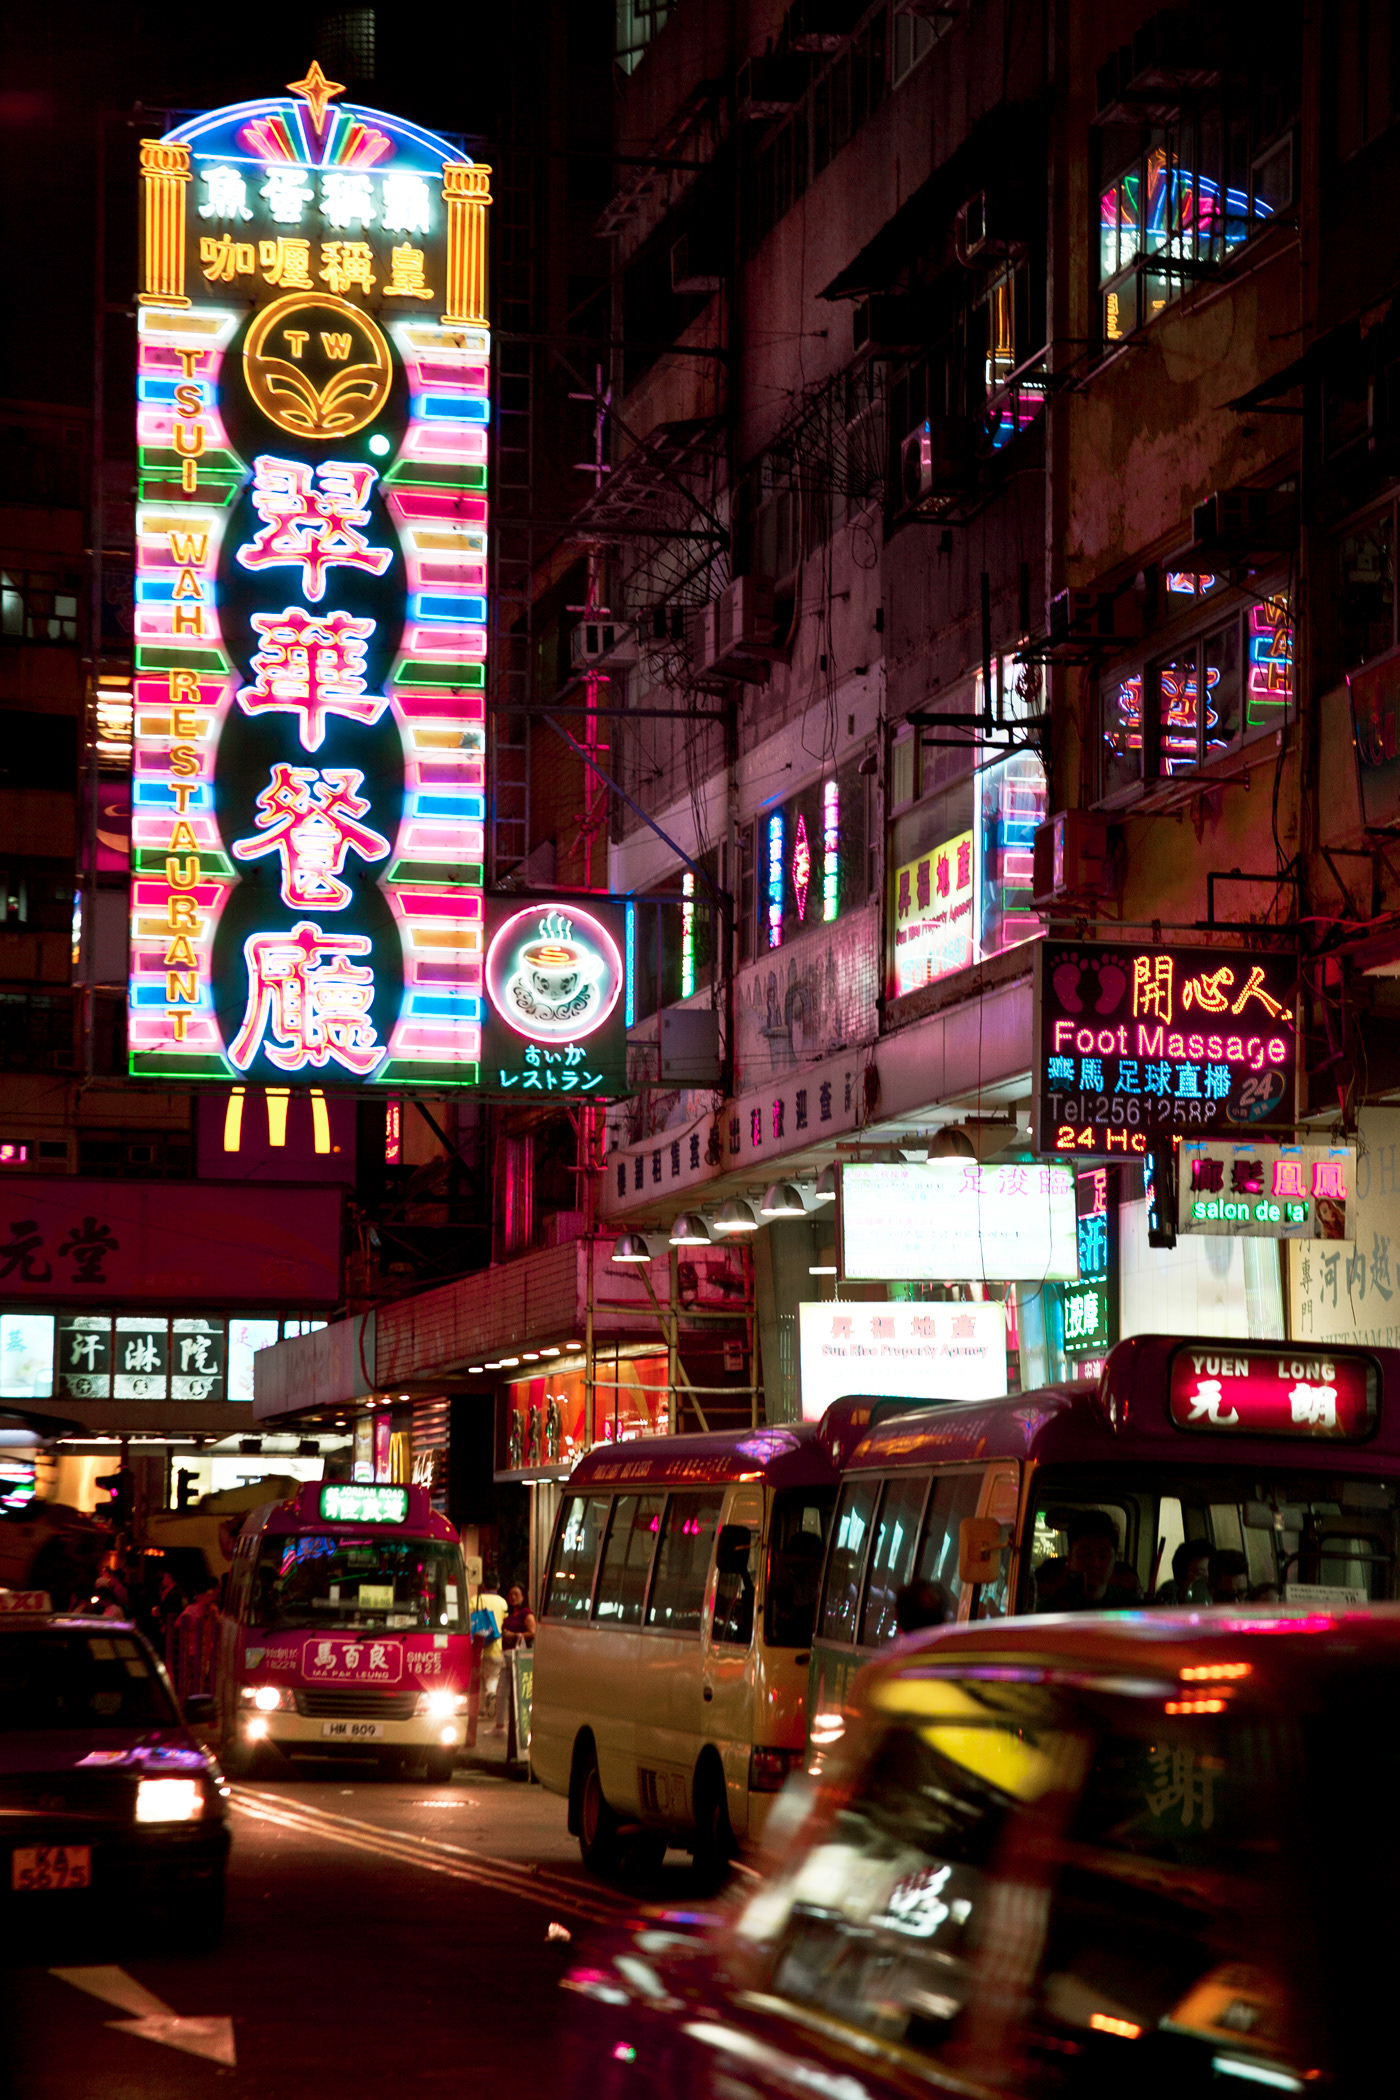 buildings,china,City Exploration,Cyberpunk,hong kong macau,modern architecture,neon,night photography,Street,Urban